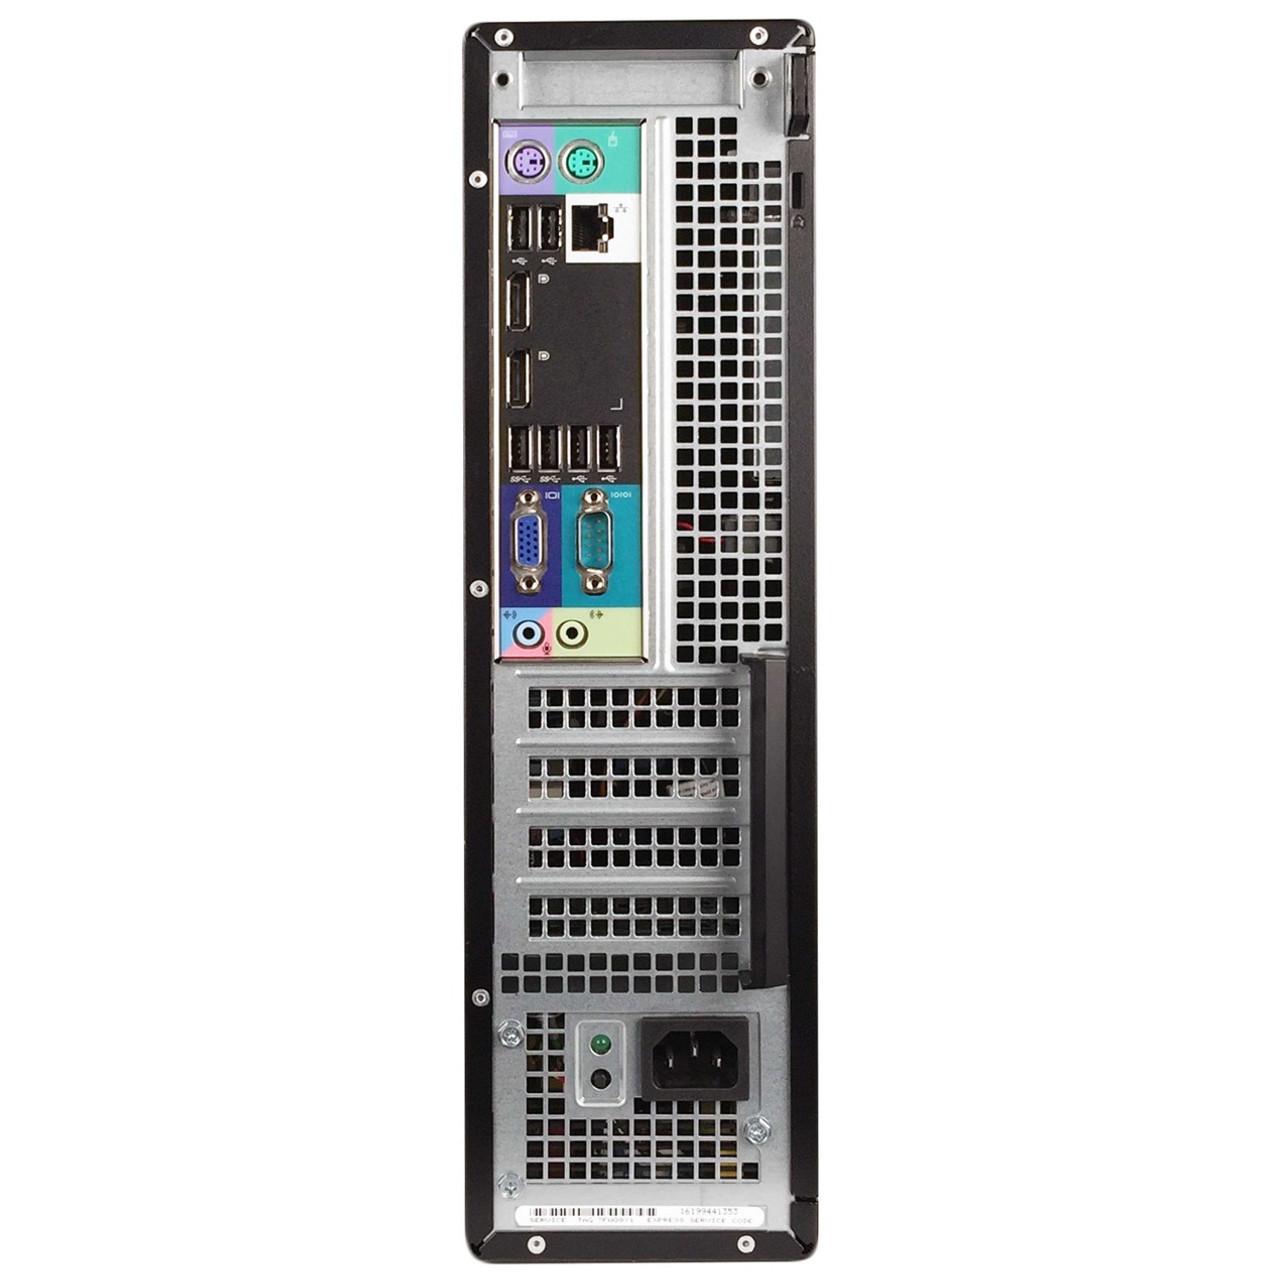 Dell Optiplex 7010 SD Quad Core i5 3.20GHz, 8GB Ram, 500GB HDD, DVD-RW, Windows 10 Pro 64 Desktop Computer